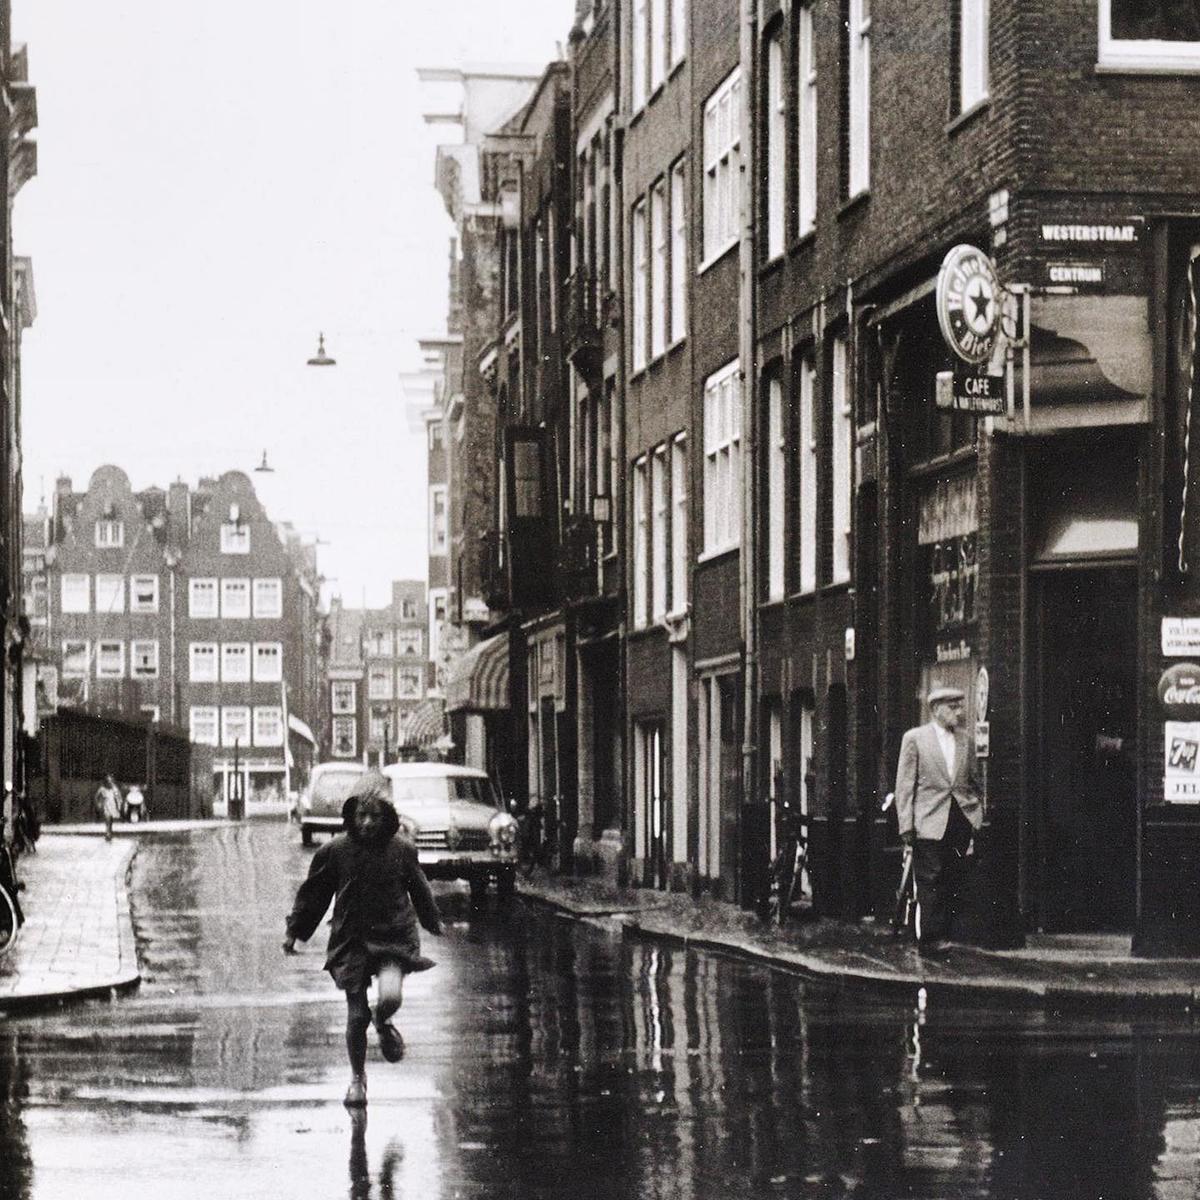 Westerstraat Amsterdam Netherlands